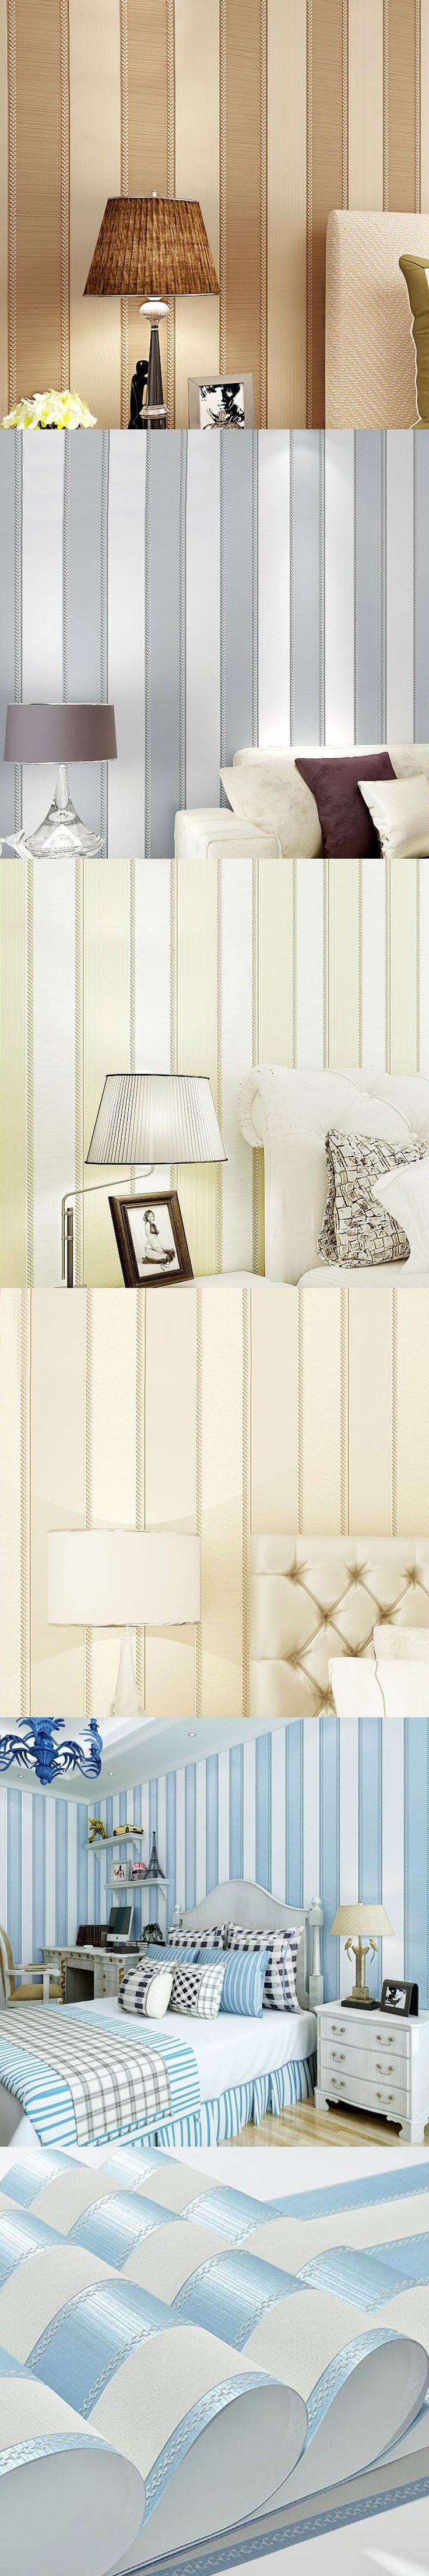 Non Woven Wallpaper Modern Minimalist Vertical Stripes Flocking Wallpaper  Bedroom Living Room Stereo 3D Backdrop Wall Home Decor